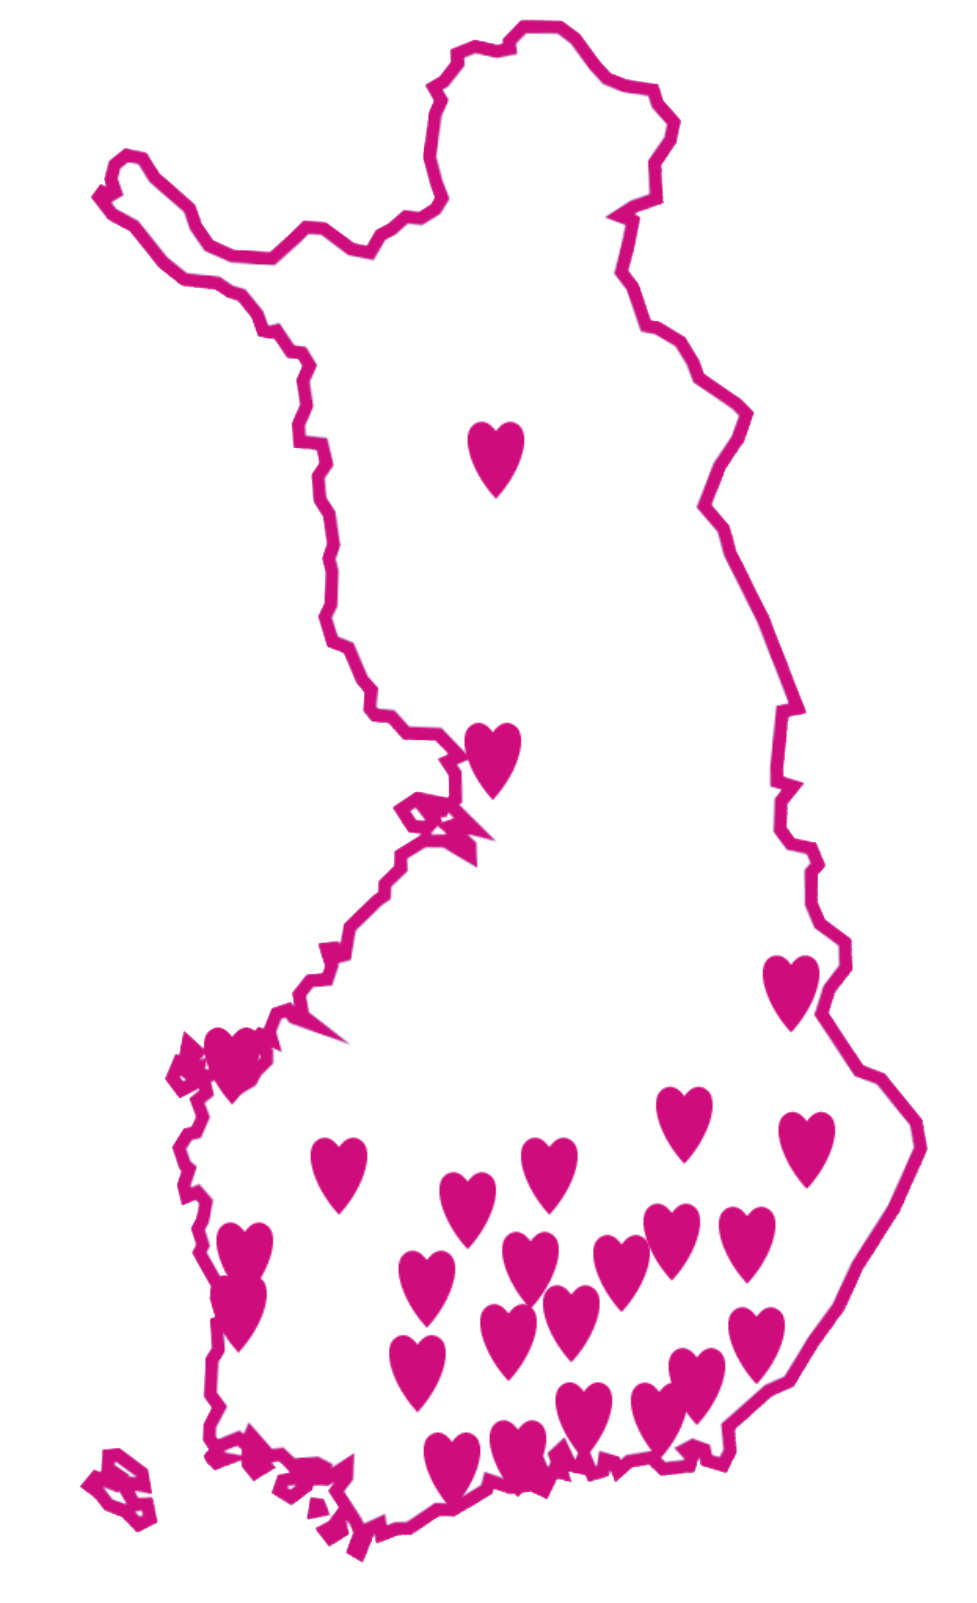 Suomen kartta -piirros